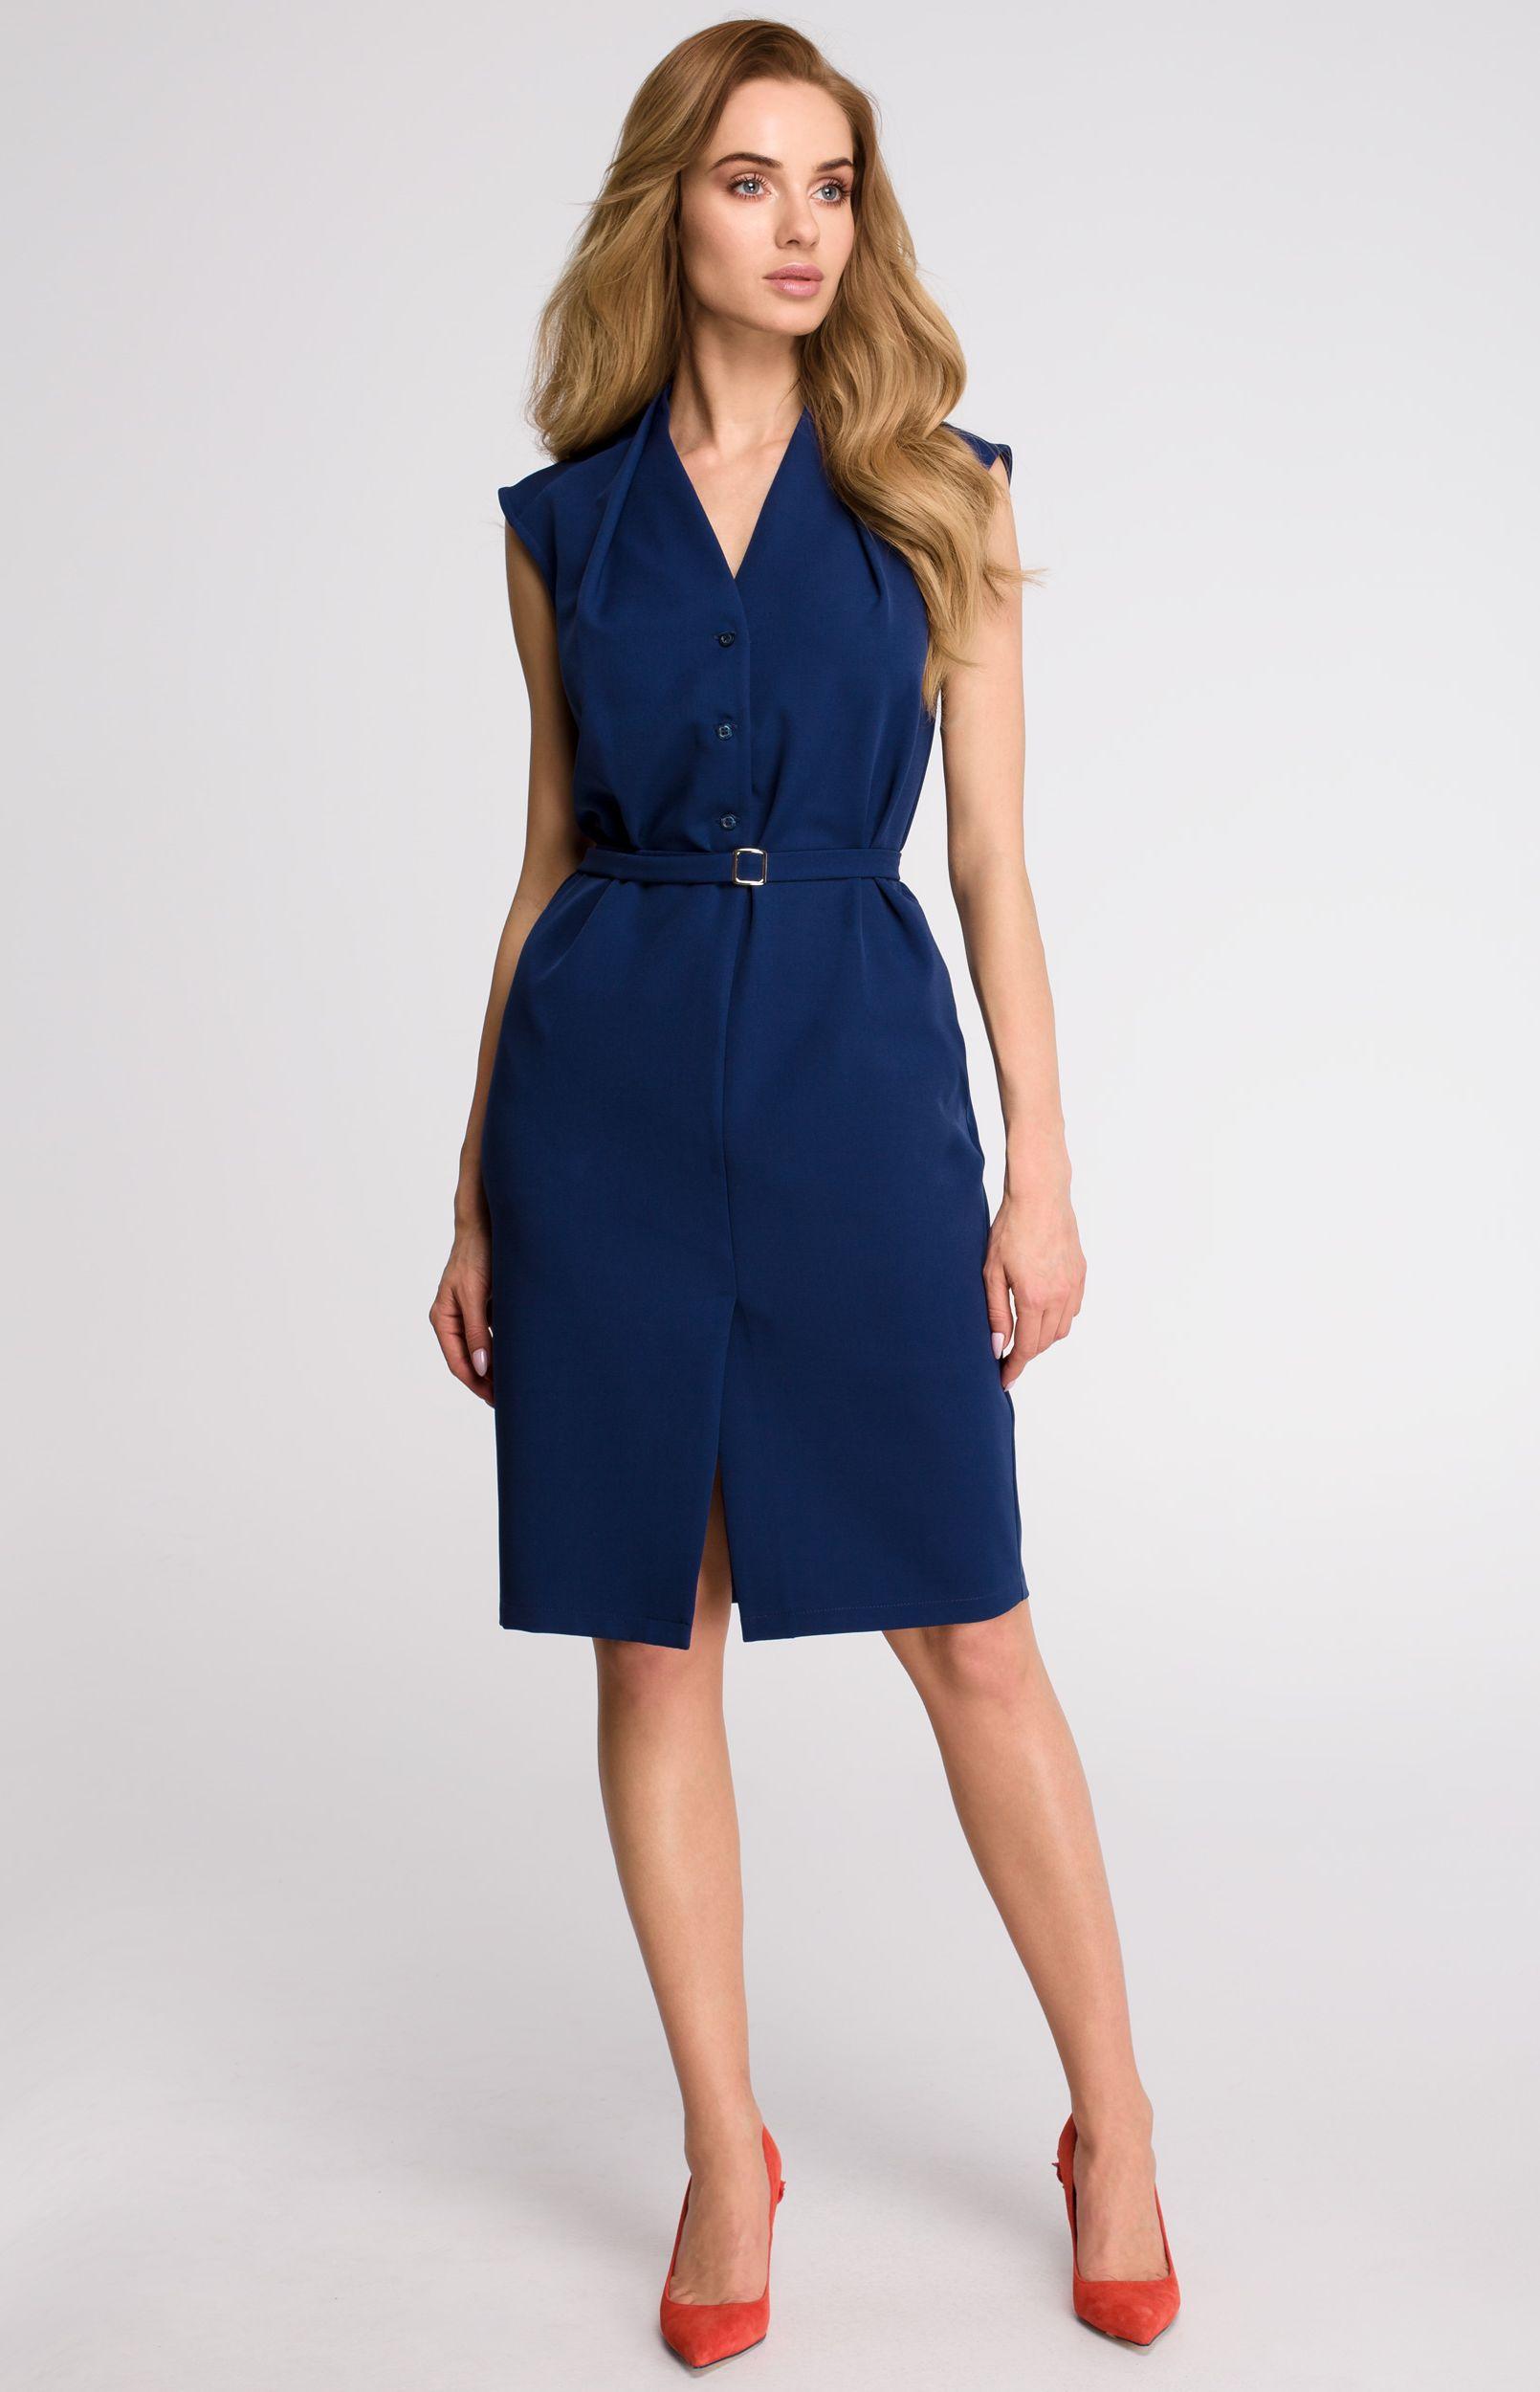 127cd3608a7 Robe chemise sans manches bleu marine Style S102BM   idresstocode ...